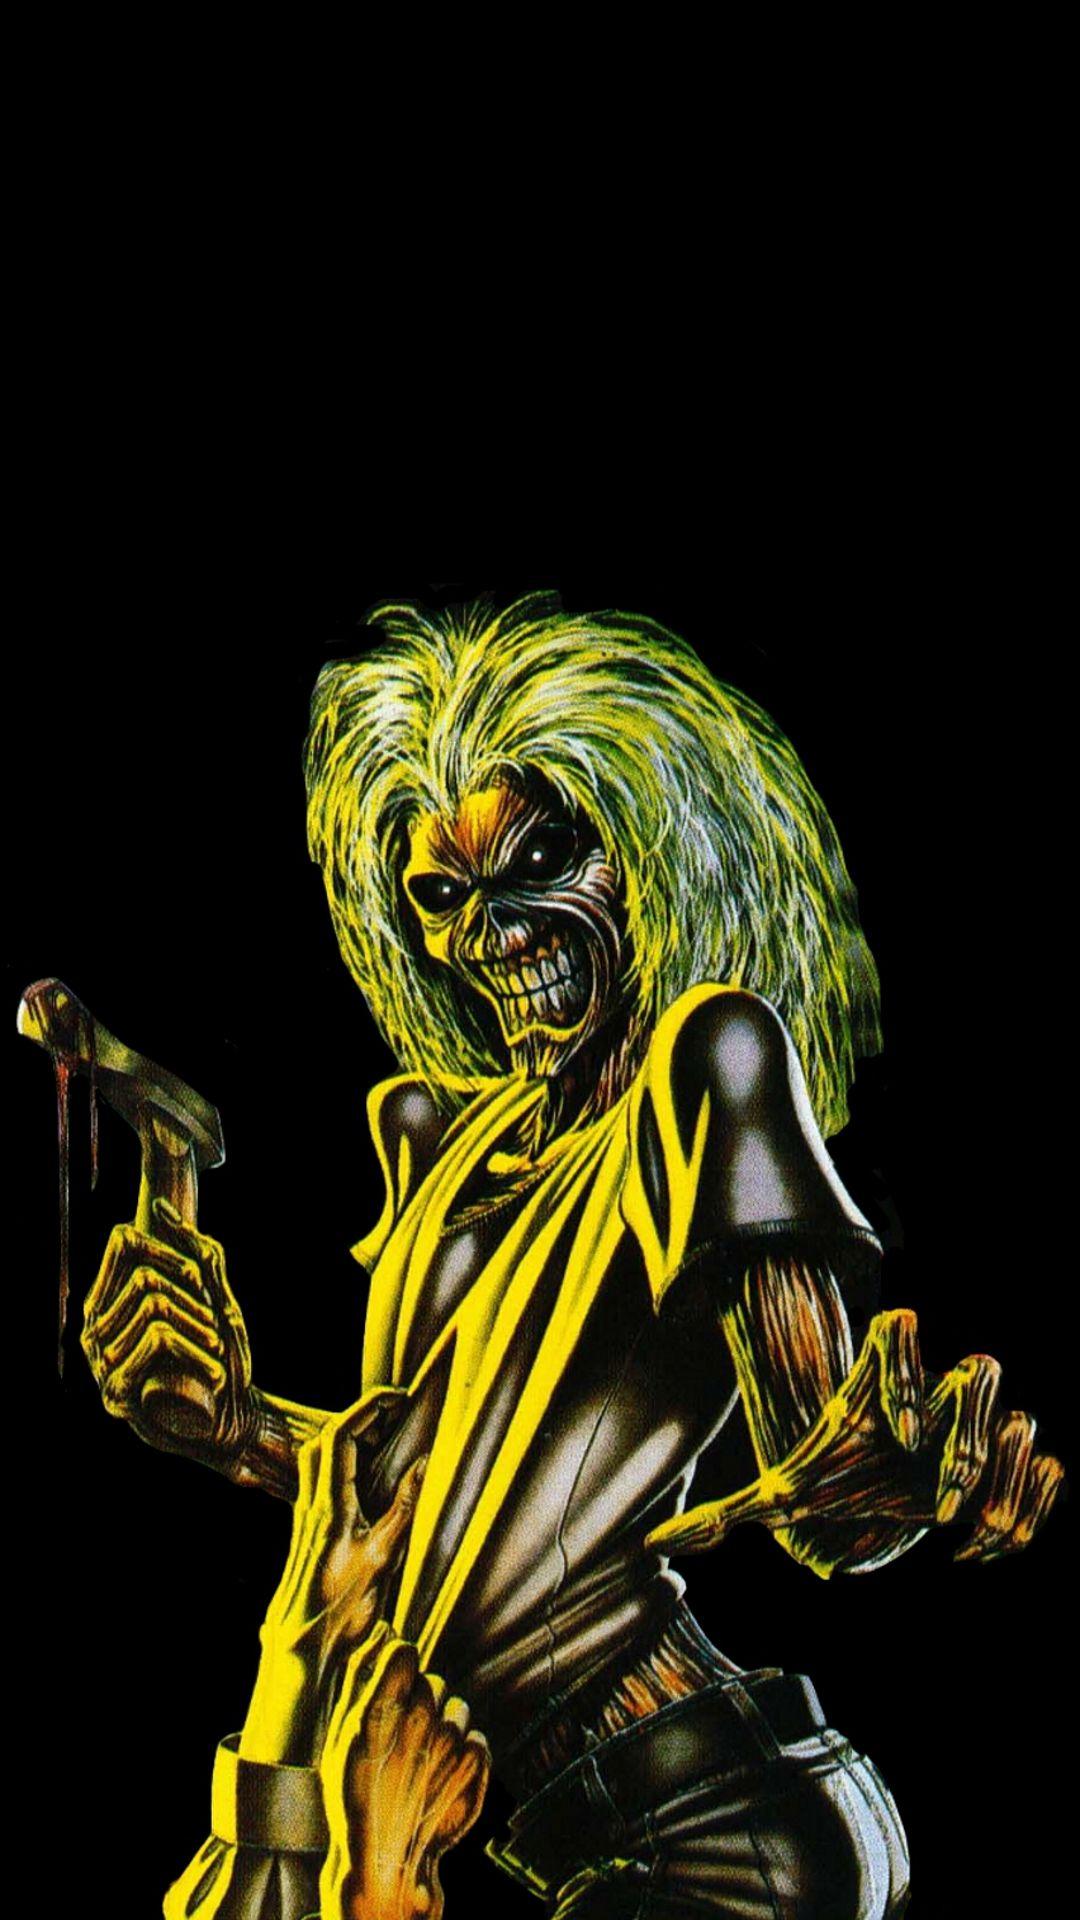 Iron Maiden in 2019 Iron maiden posters, Iron maiden